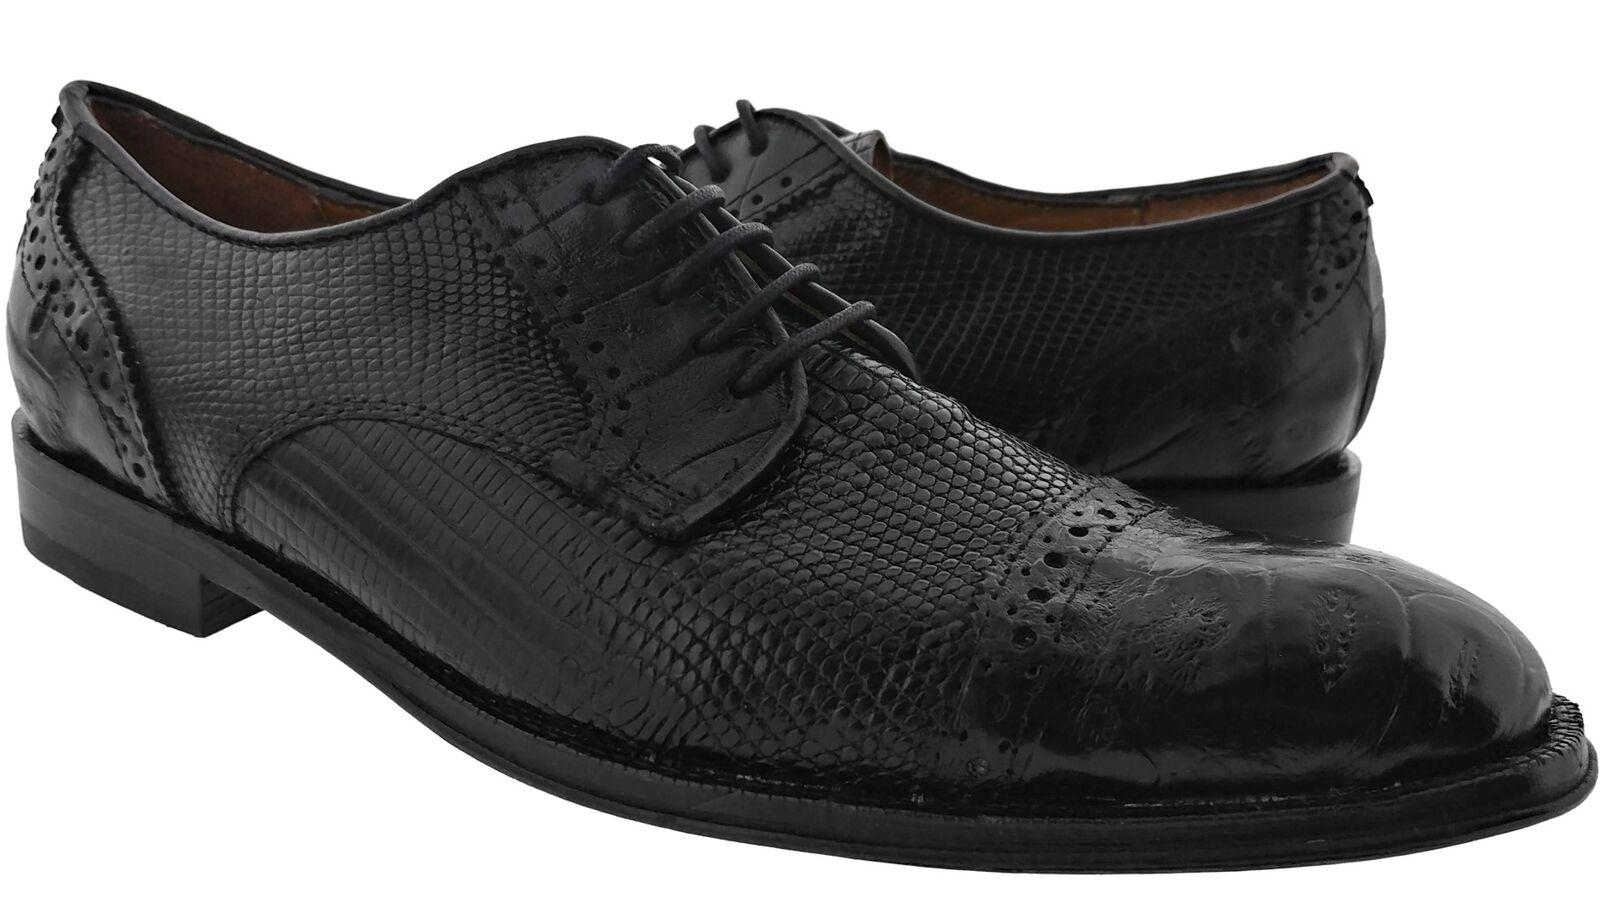 Men's Black Real Lizard Authentic Genuine Crocodile Skin Dress Shoes